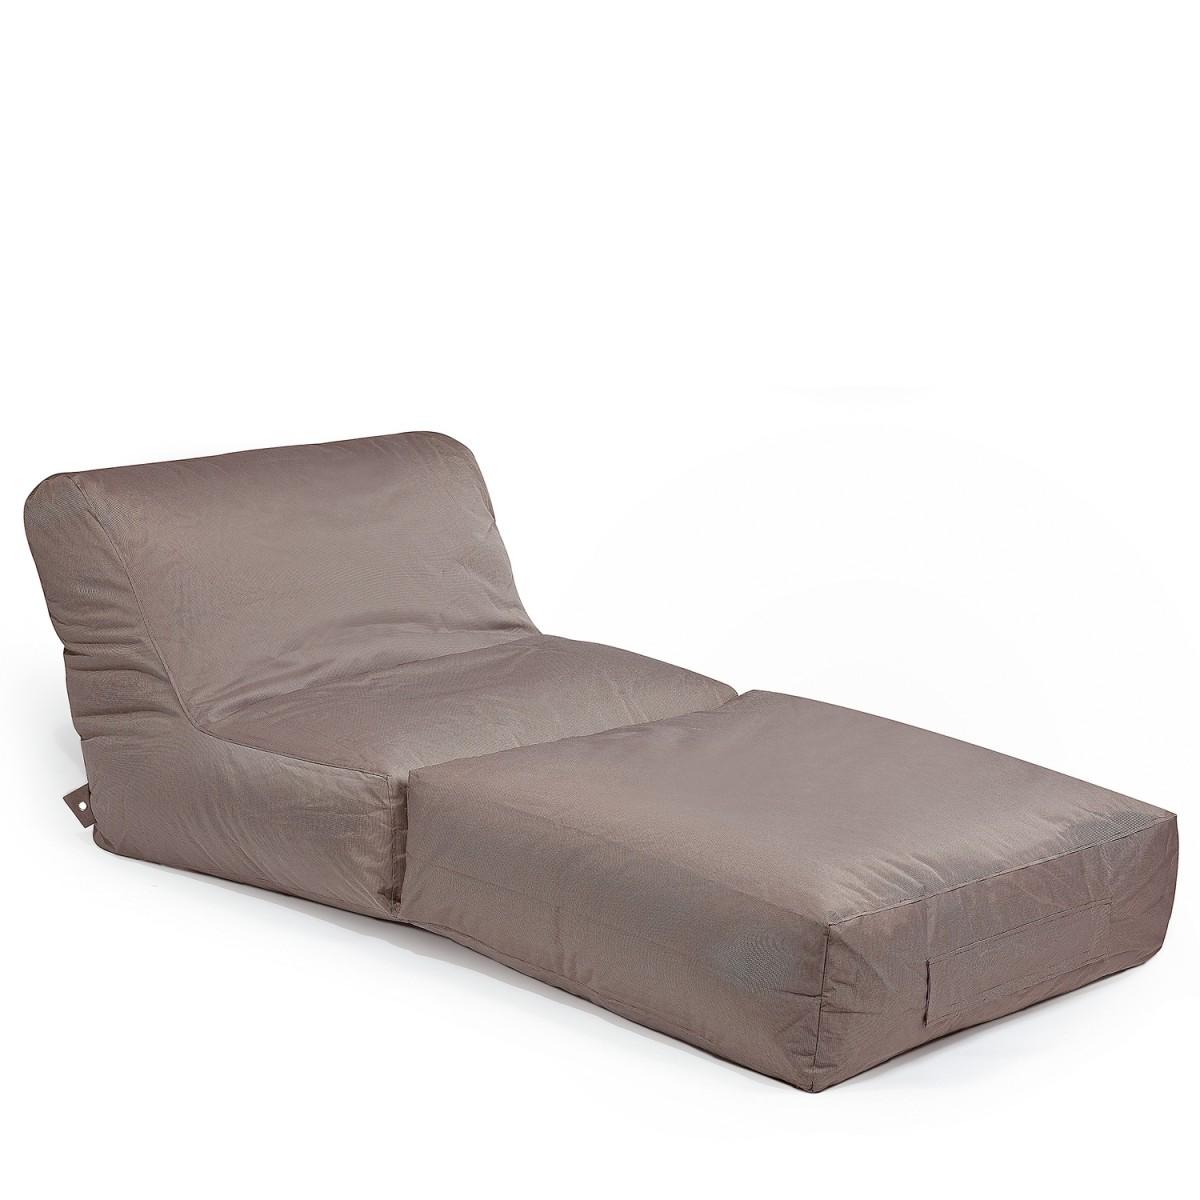 outbag peak outdoor wellness lounge garten couch. Black Bedroom Furniture Sets. Home Design Ideas